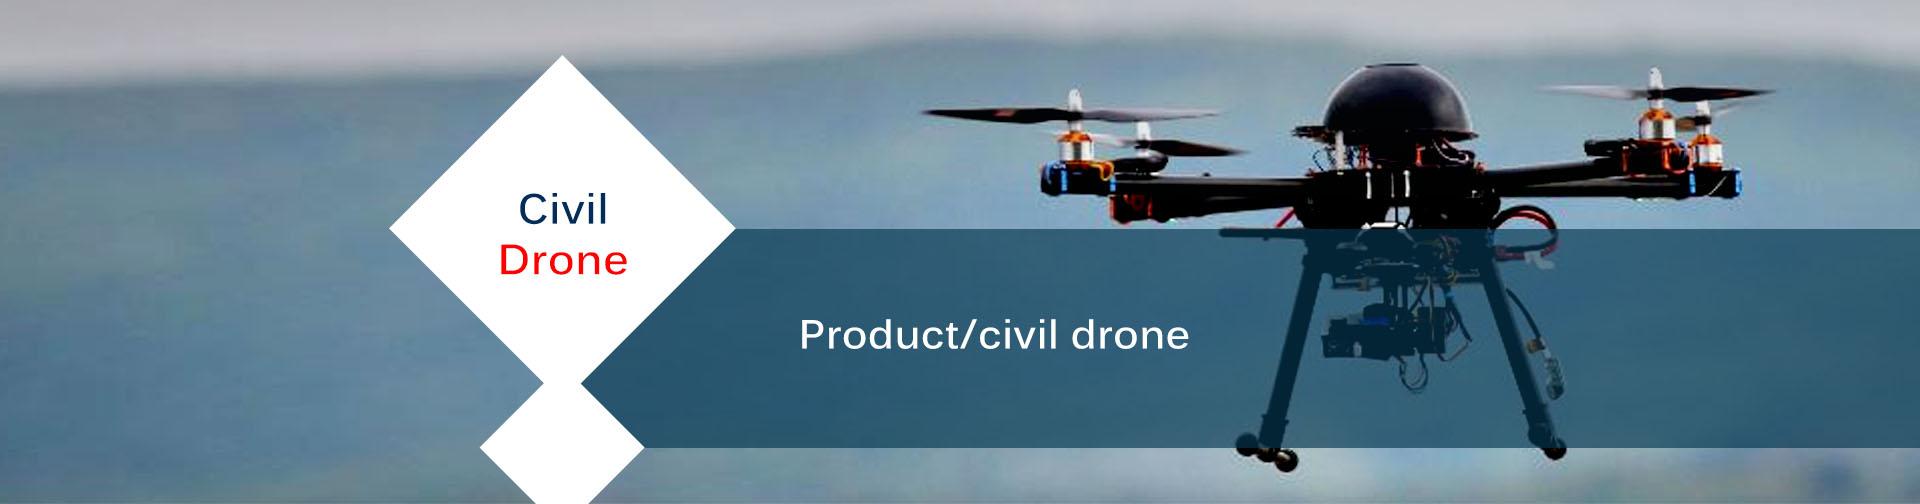 drone parrot bebop 2 pack fpv